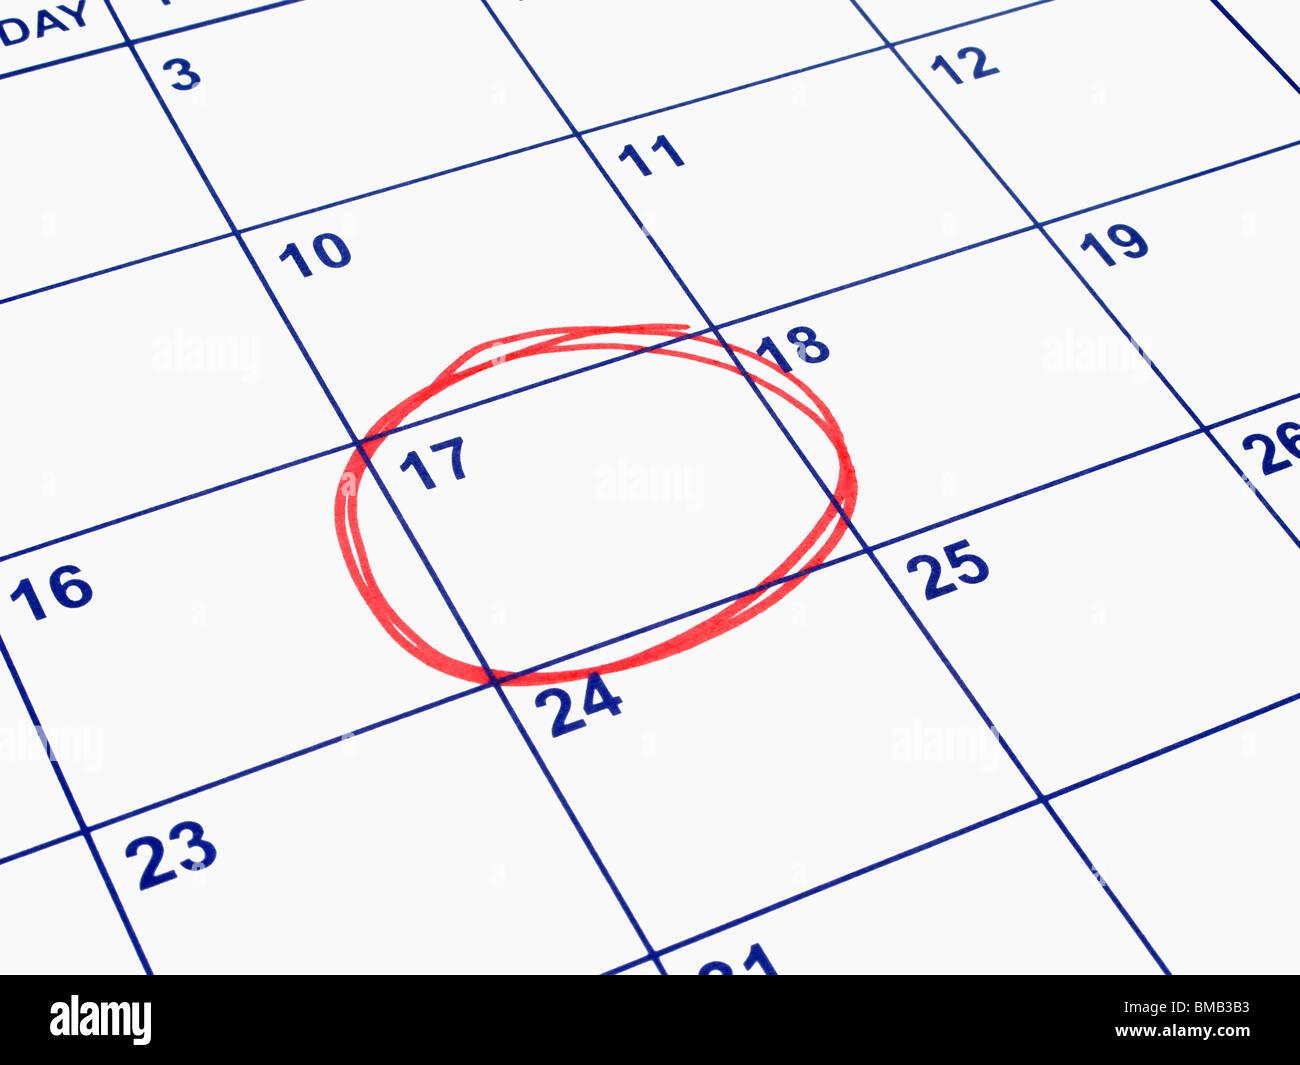 Calendar Date.Calendar Date Circled Stock Photos Calendar Date Circled Stock